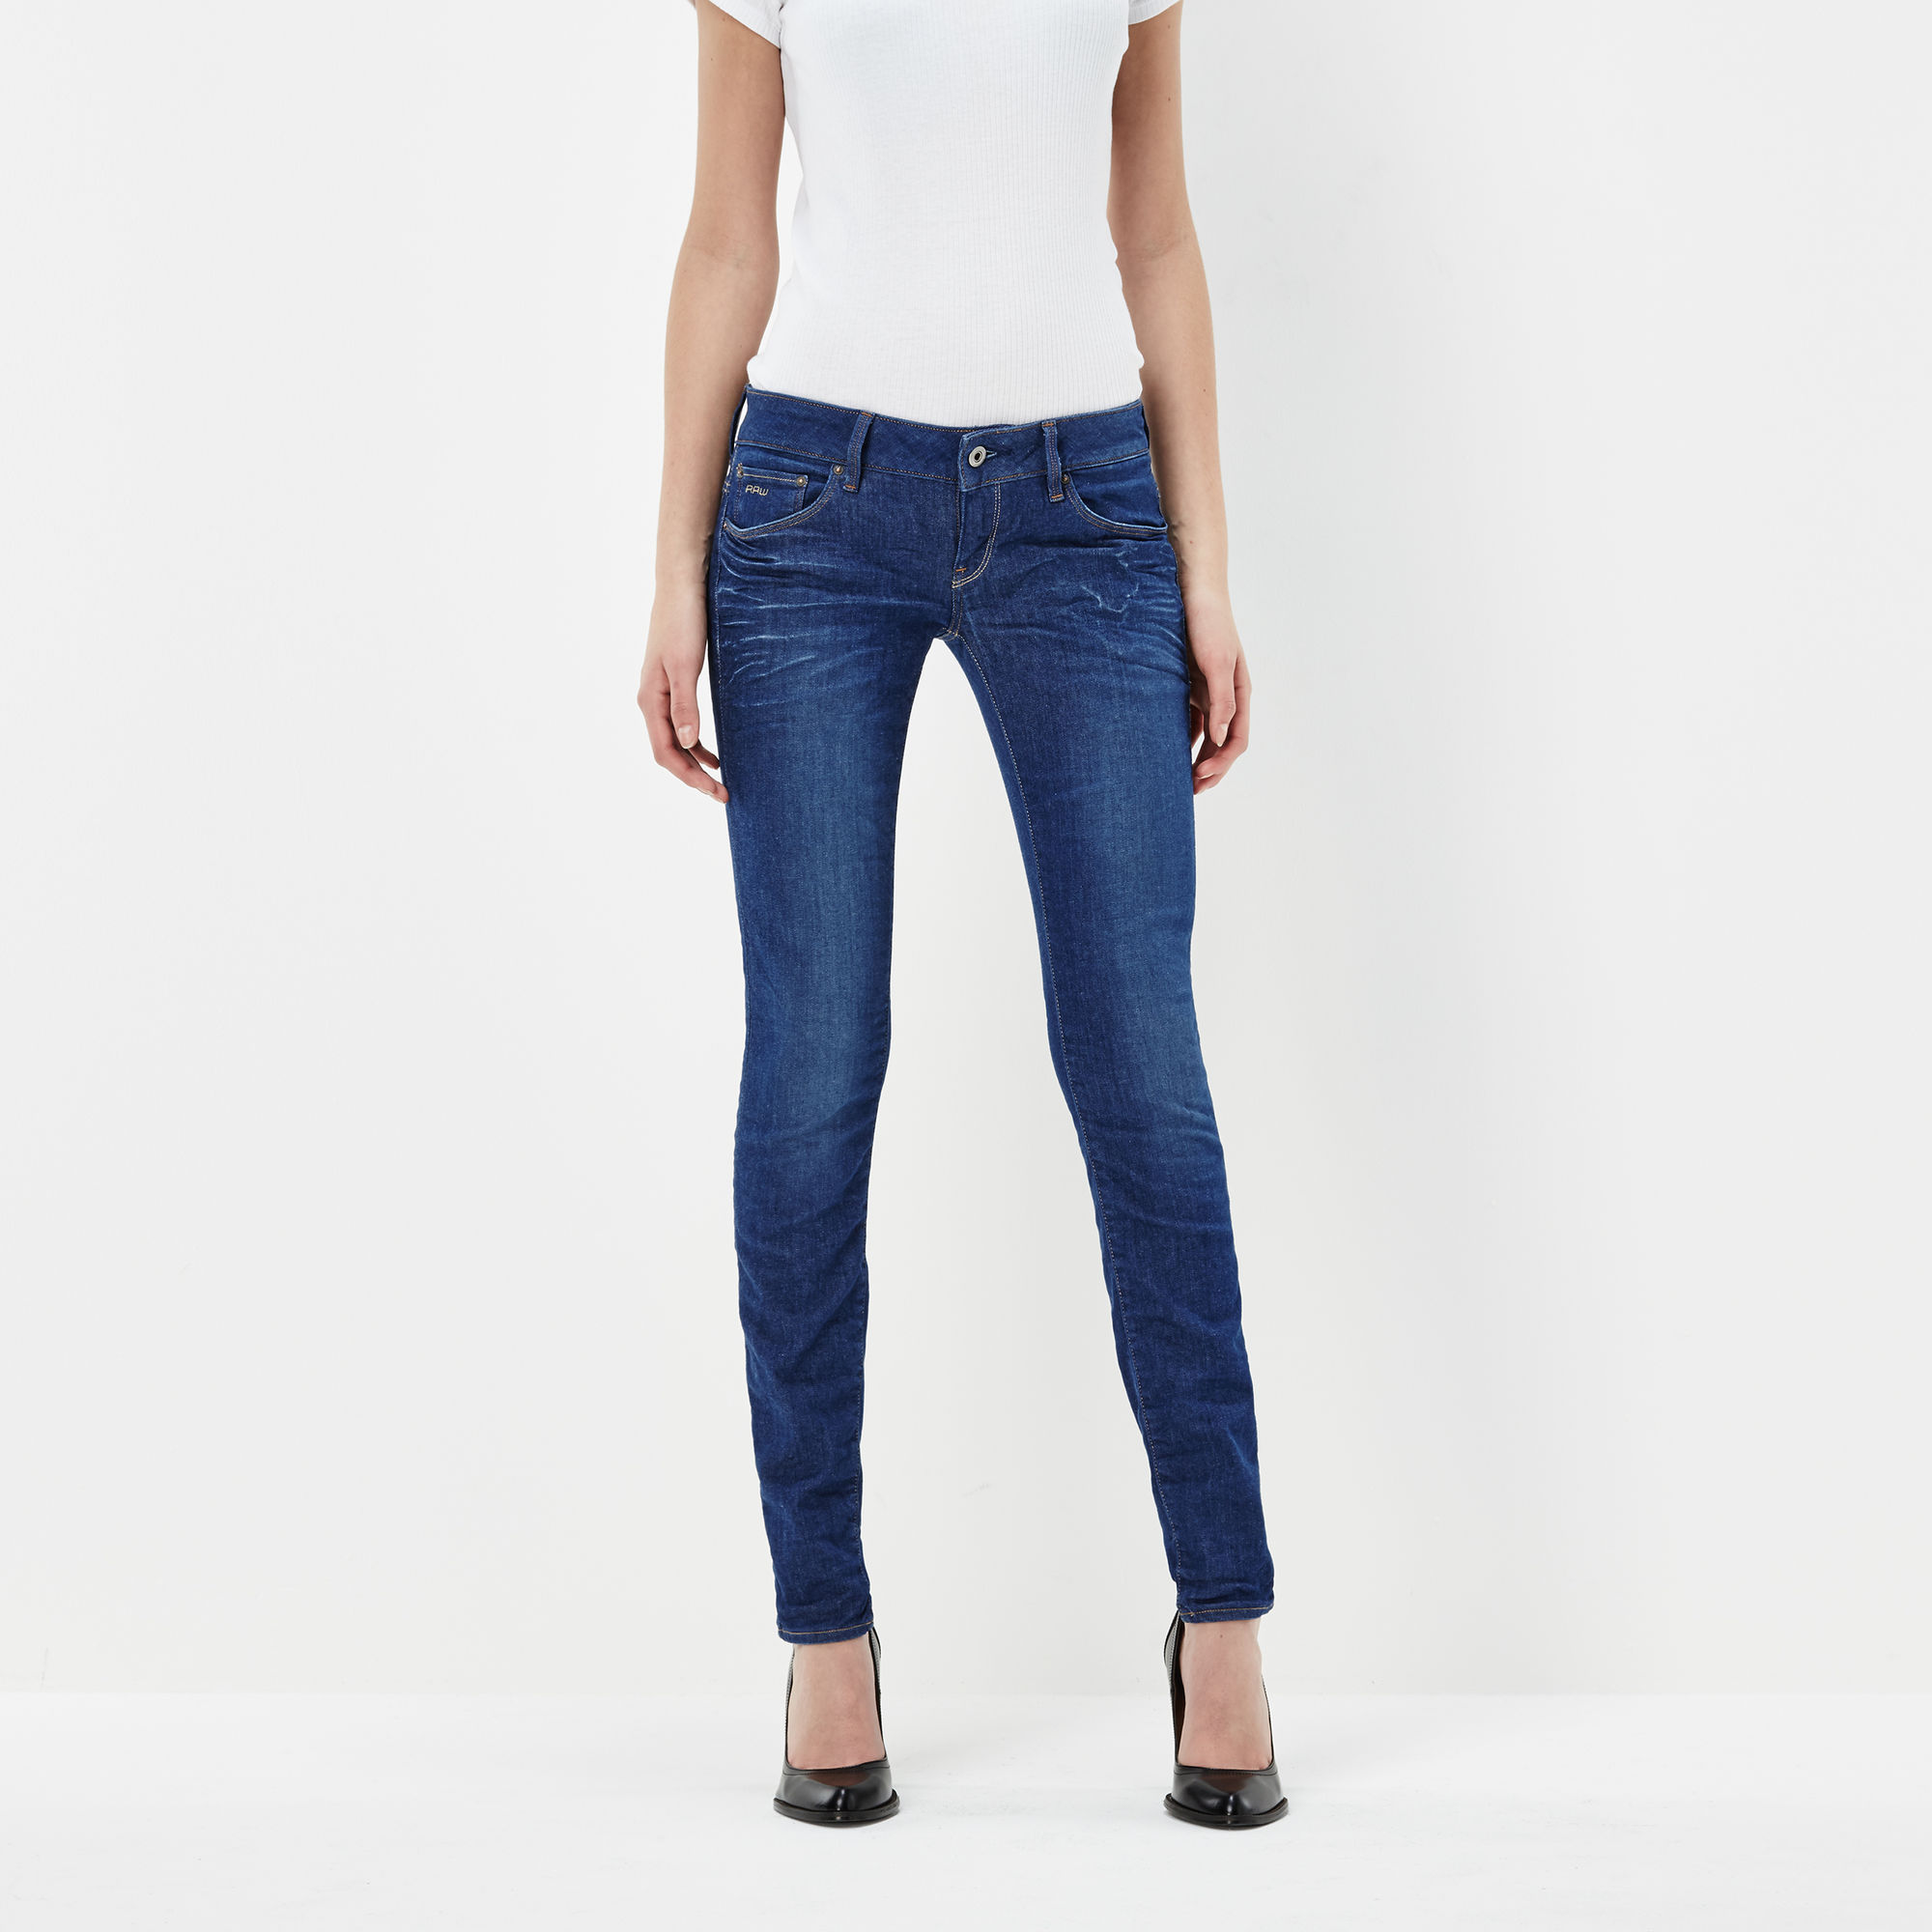 Van G Star Raw 3301 Low Waist Skinny Jeans Prijsvergelijk nu!